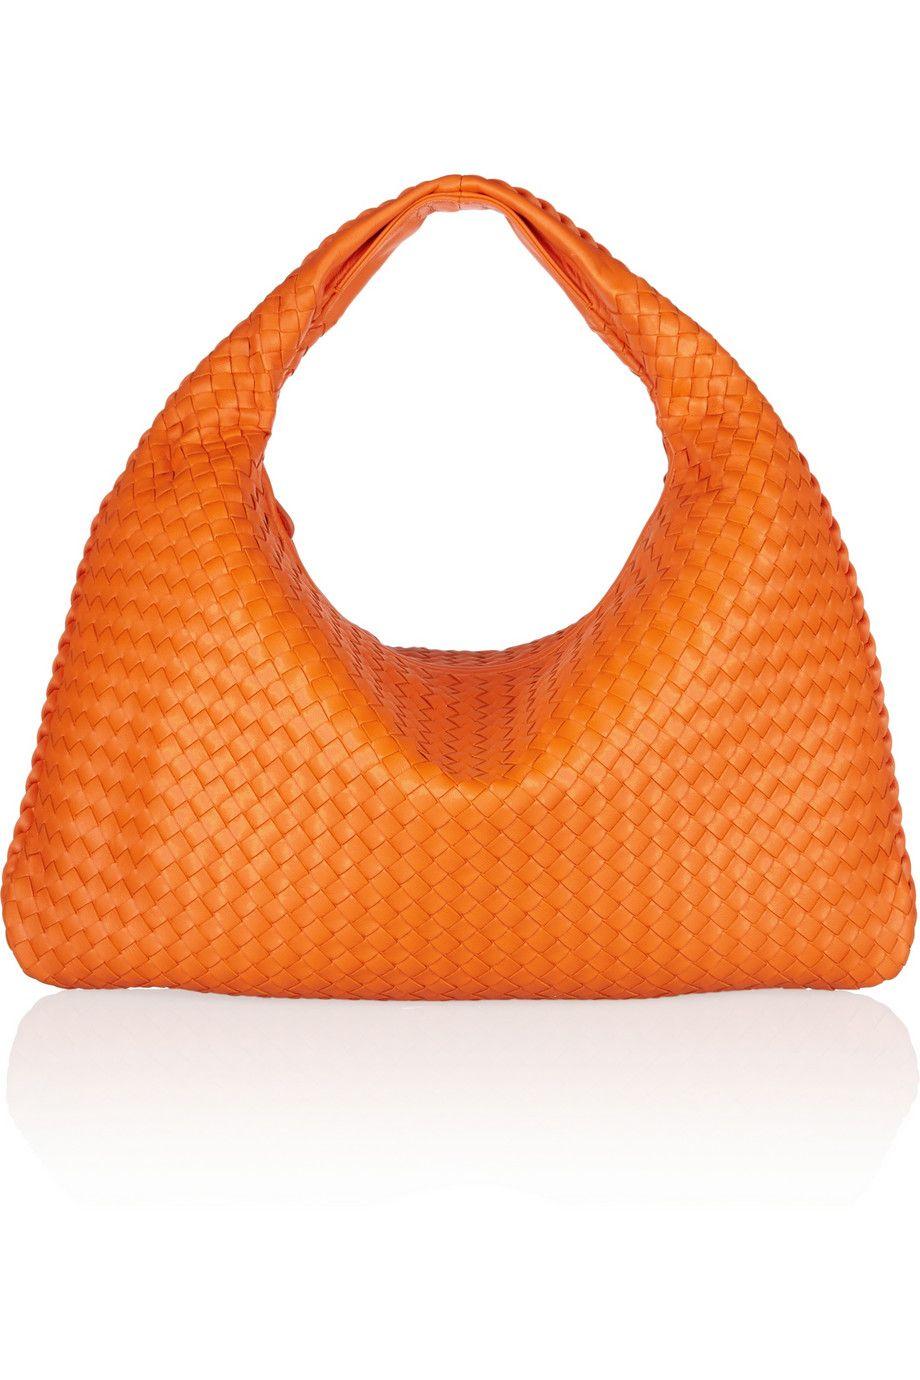 05dbe56d881 Bottega Veneta   Large Veneta intrecciato leather shoulder bag   NET-A -PORTER.COM